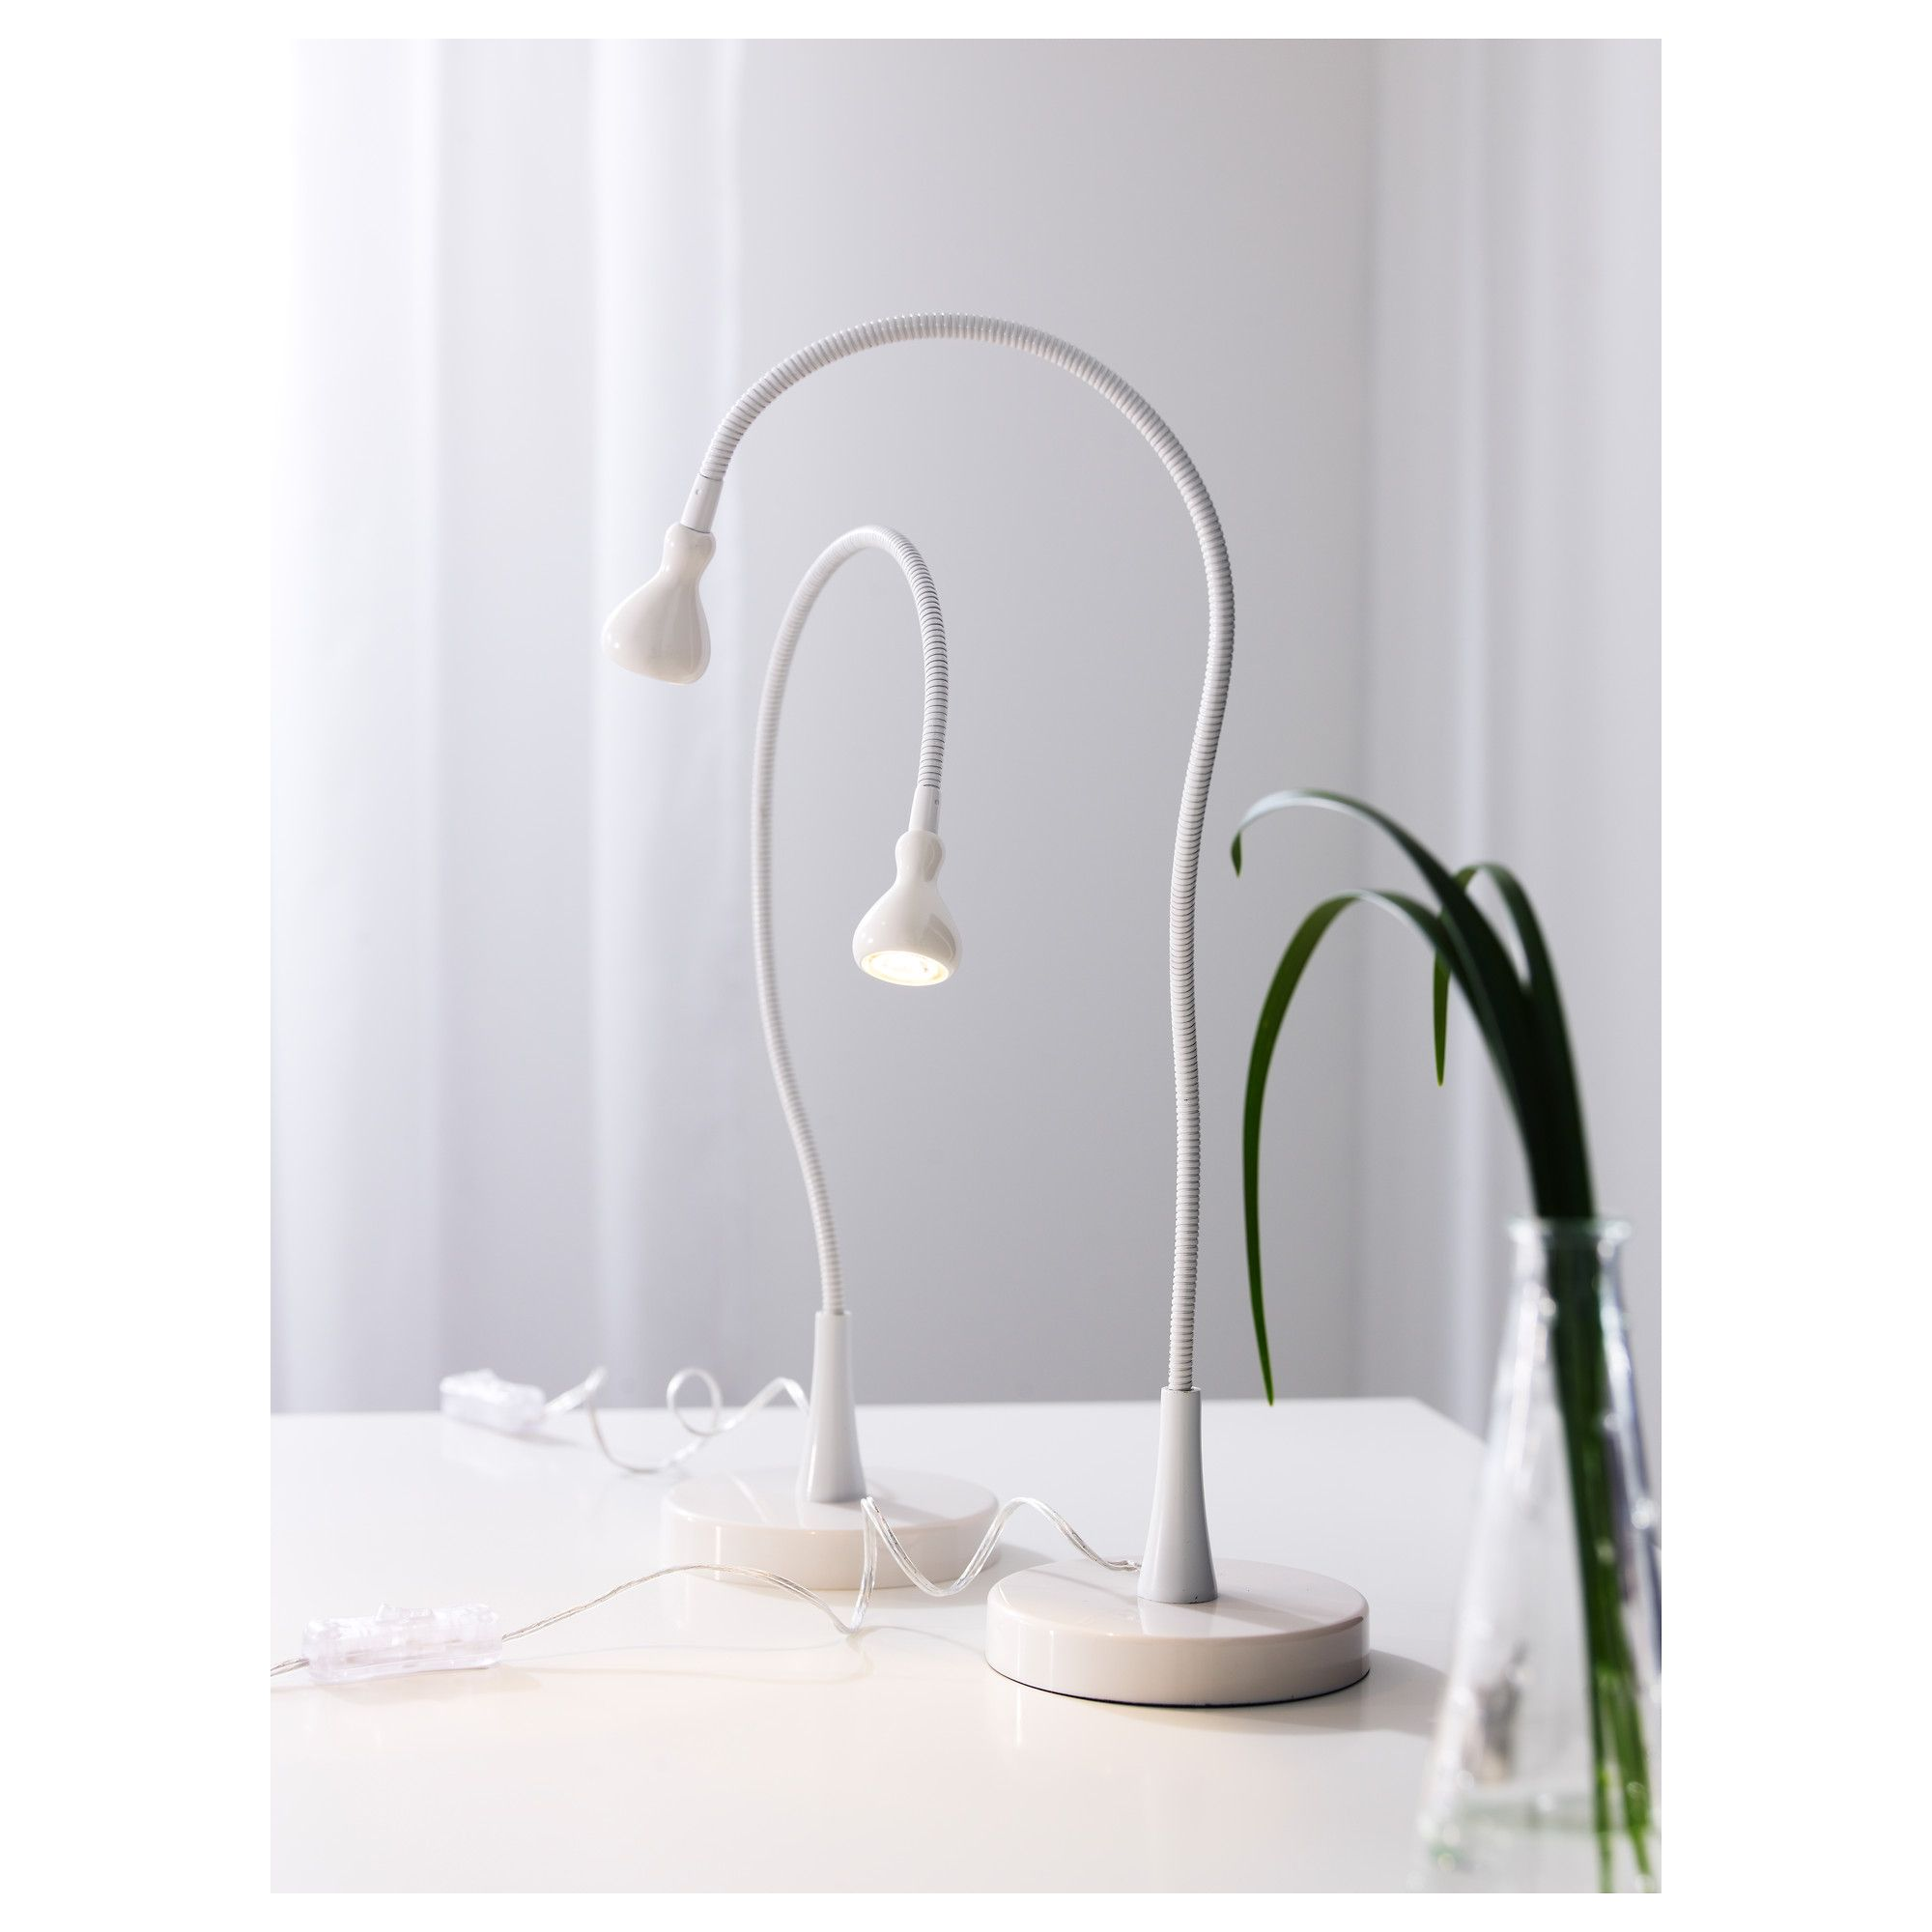 ikea jansj led work lamp white en 2018 products. Black Bedroom Furniture Sets. Home Design Ideas